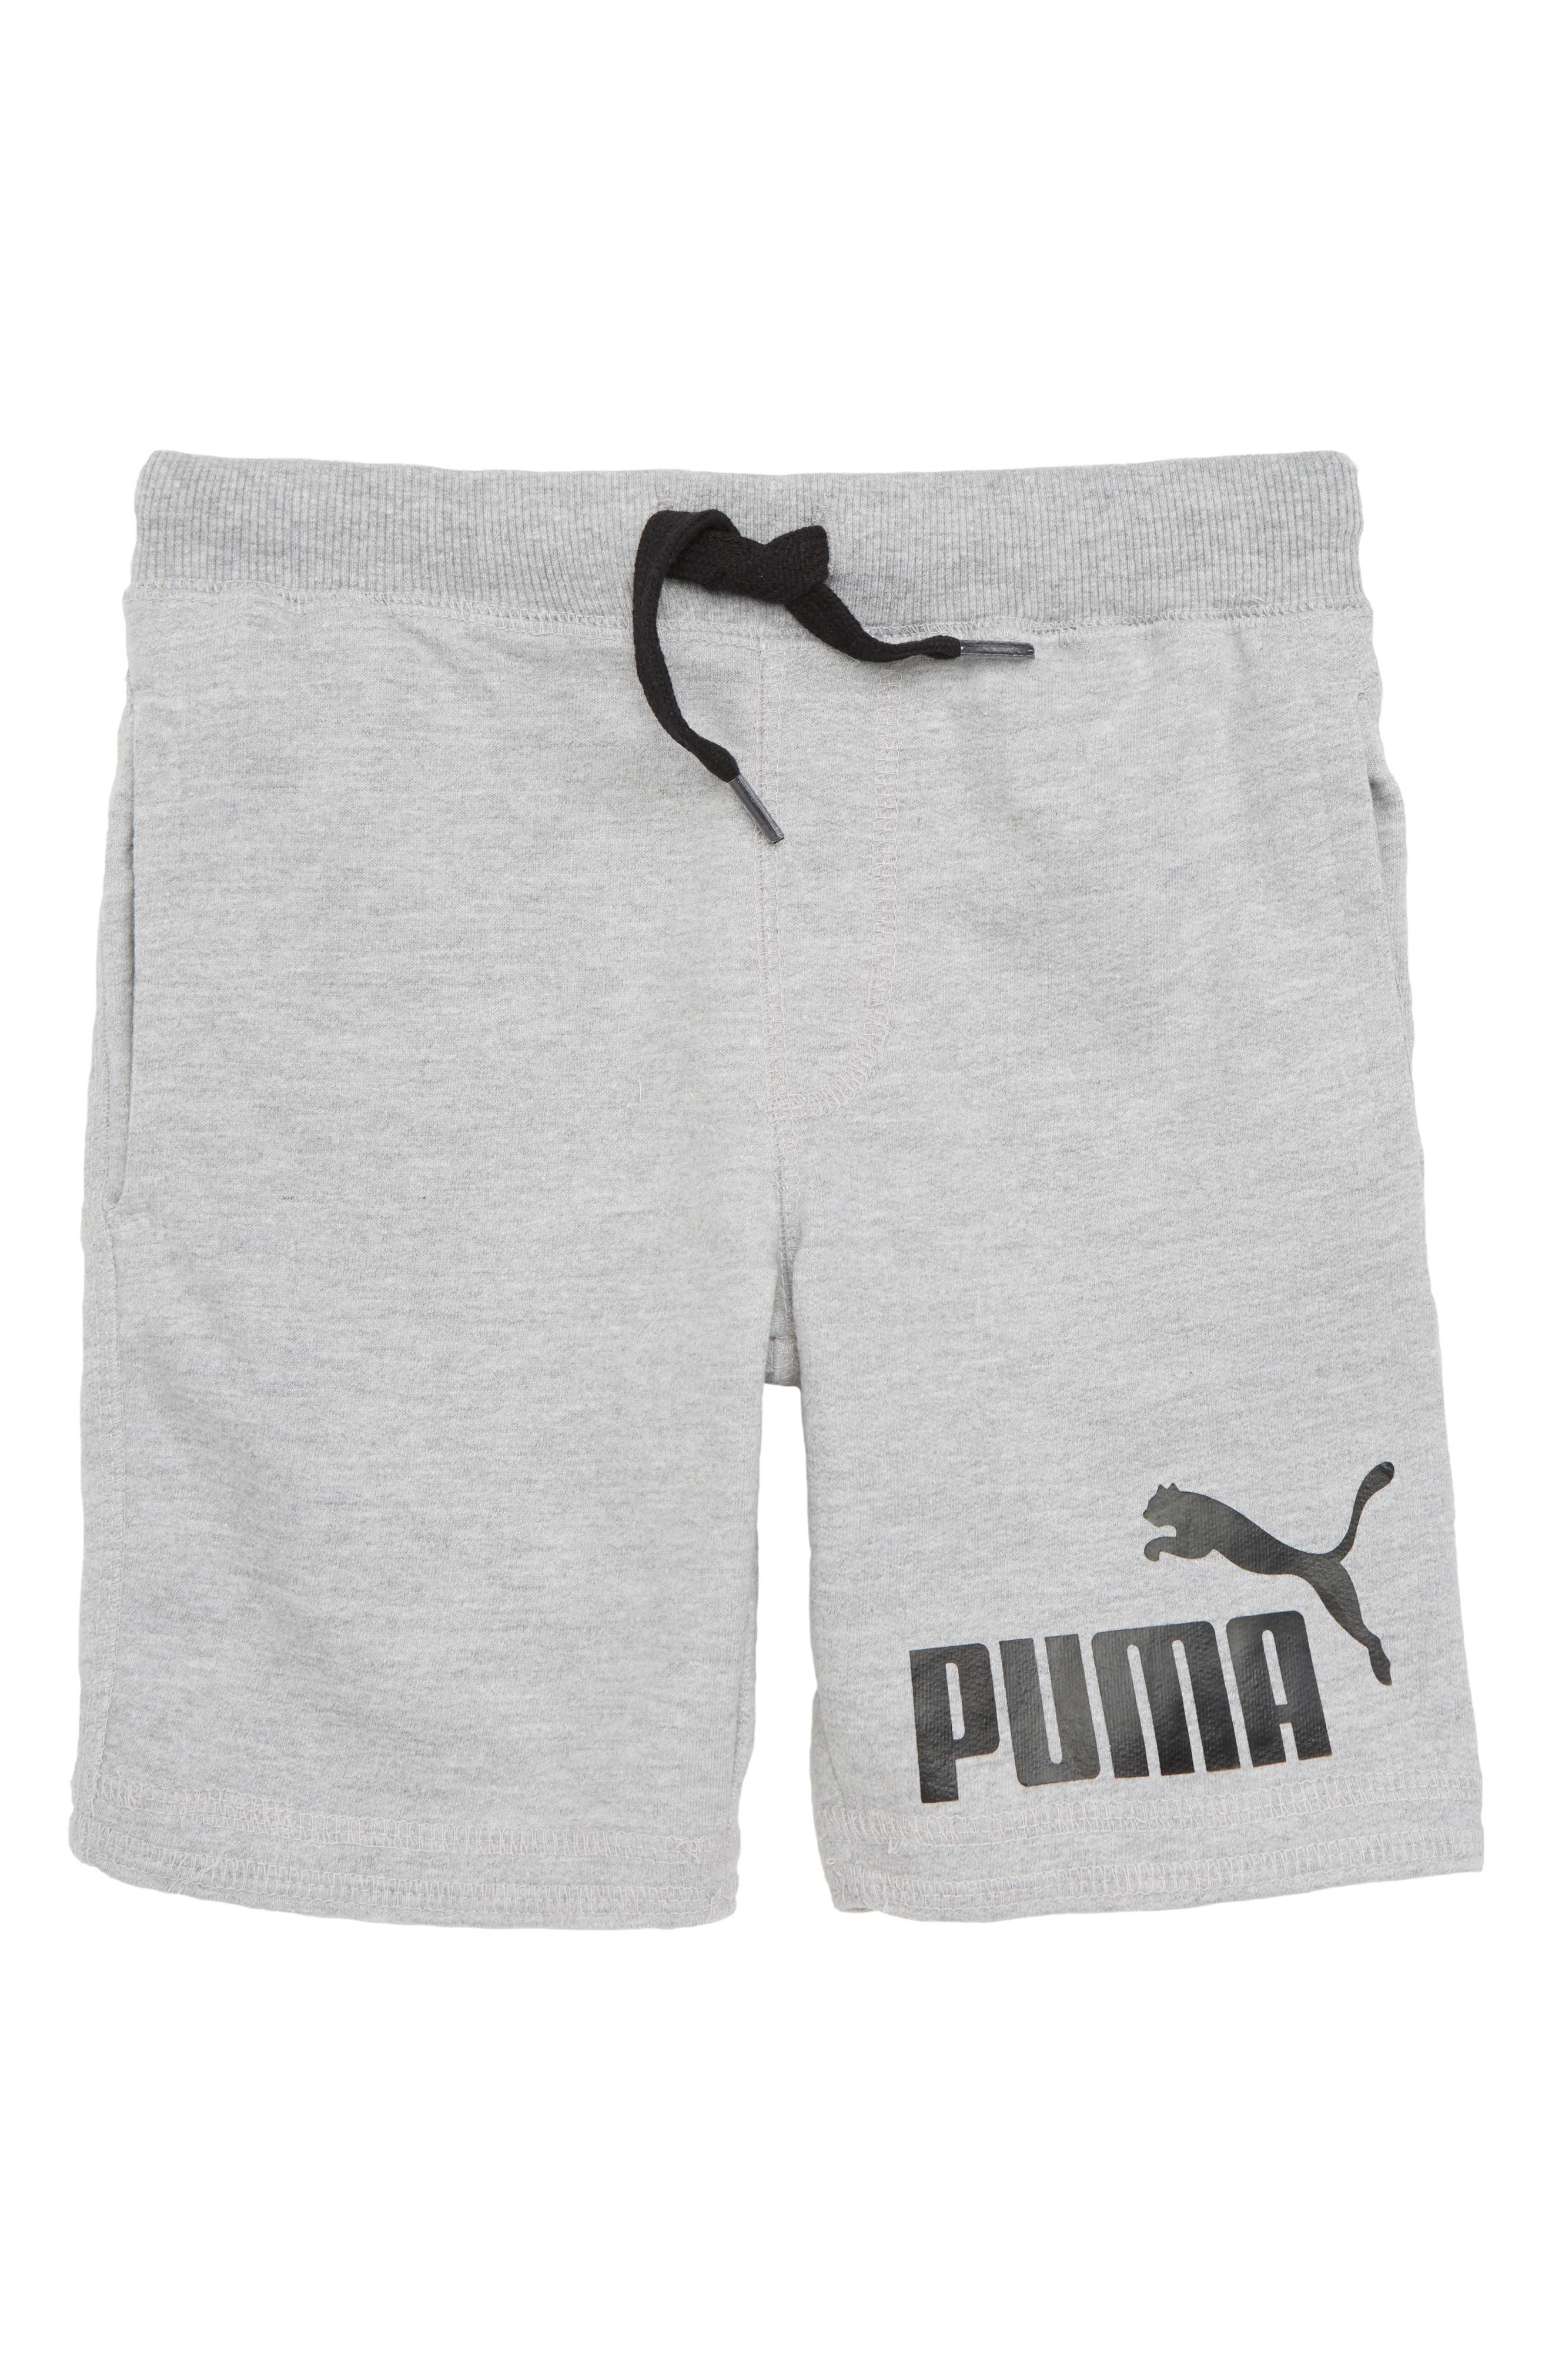 PUMA Stock Terry Shorts (Big Boys)